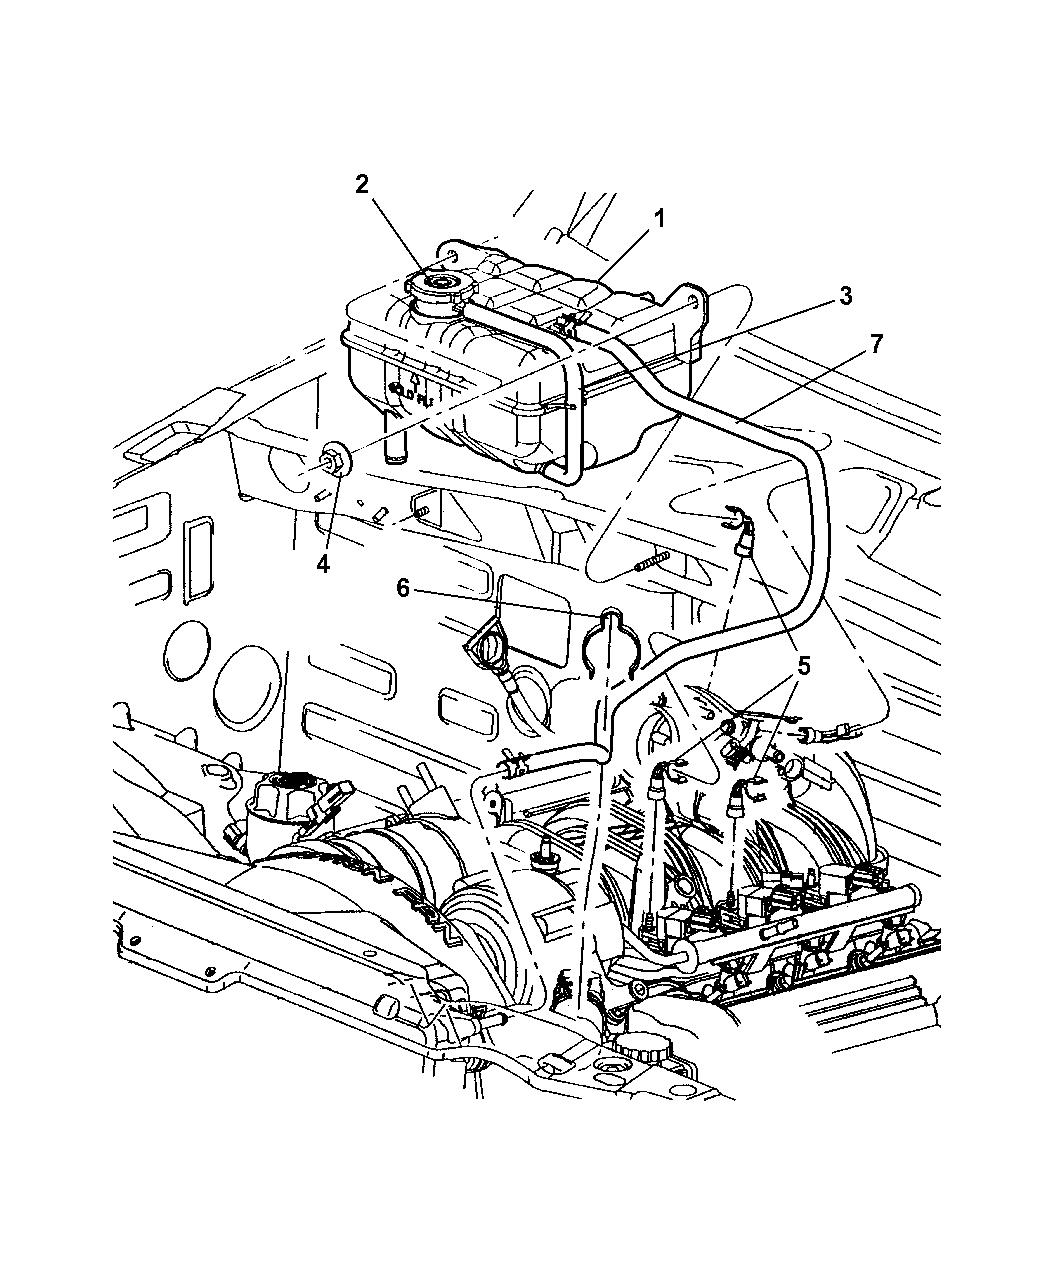 2005 jeep liberty coolant tank - thumbnail 2